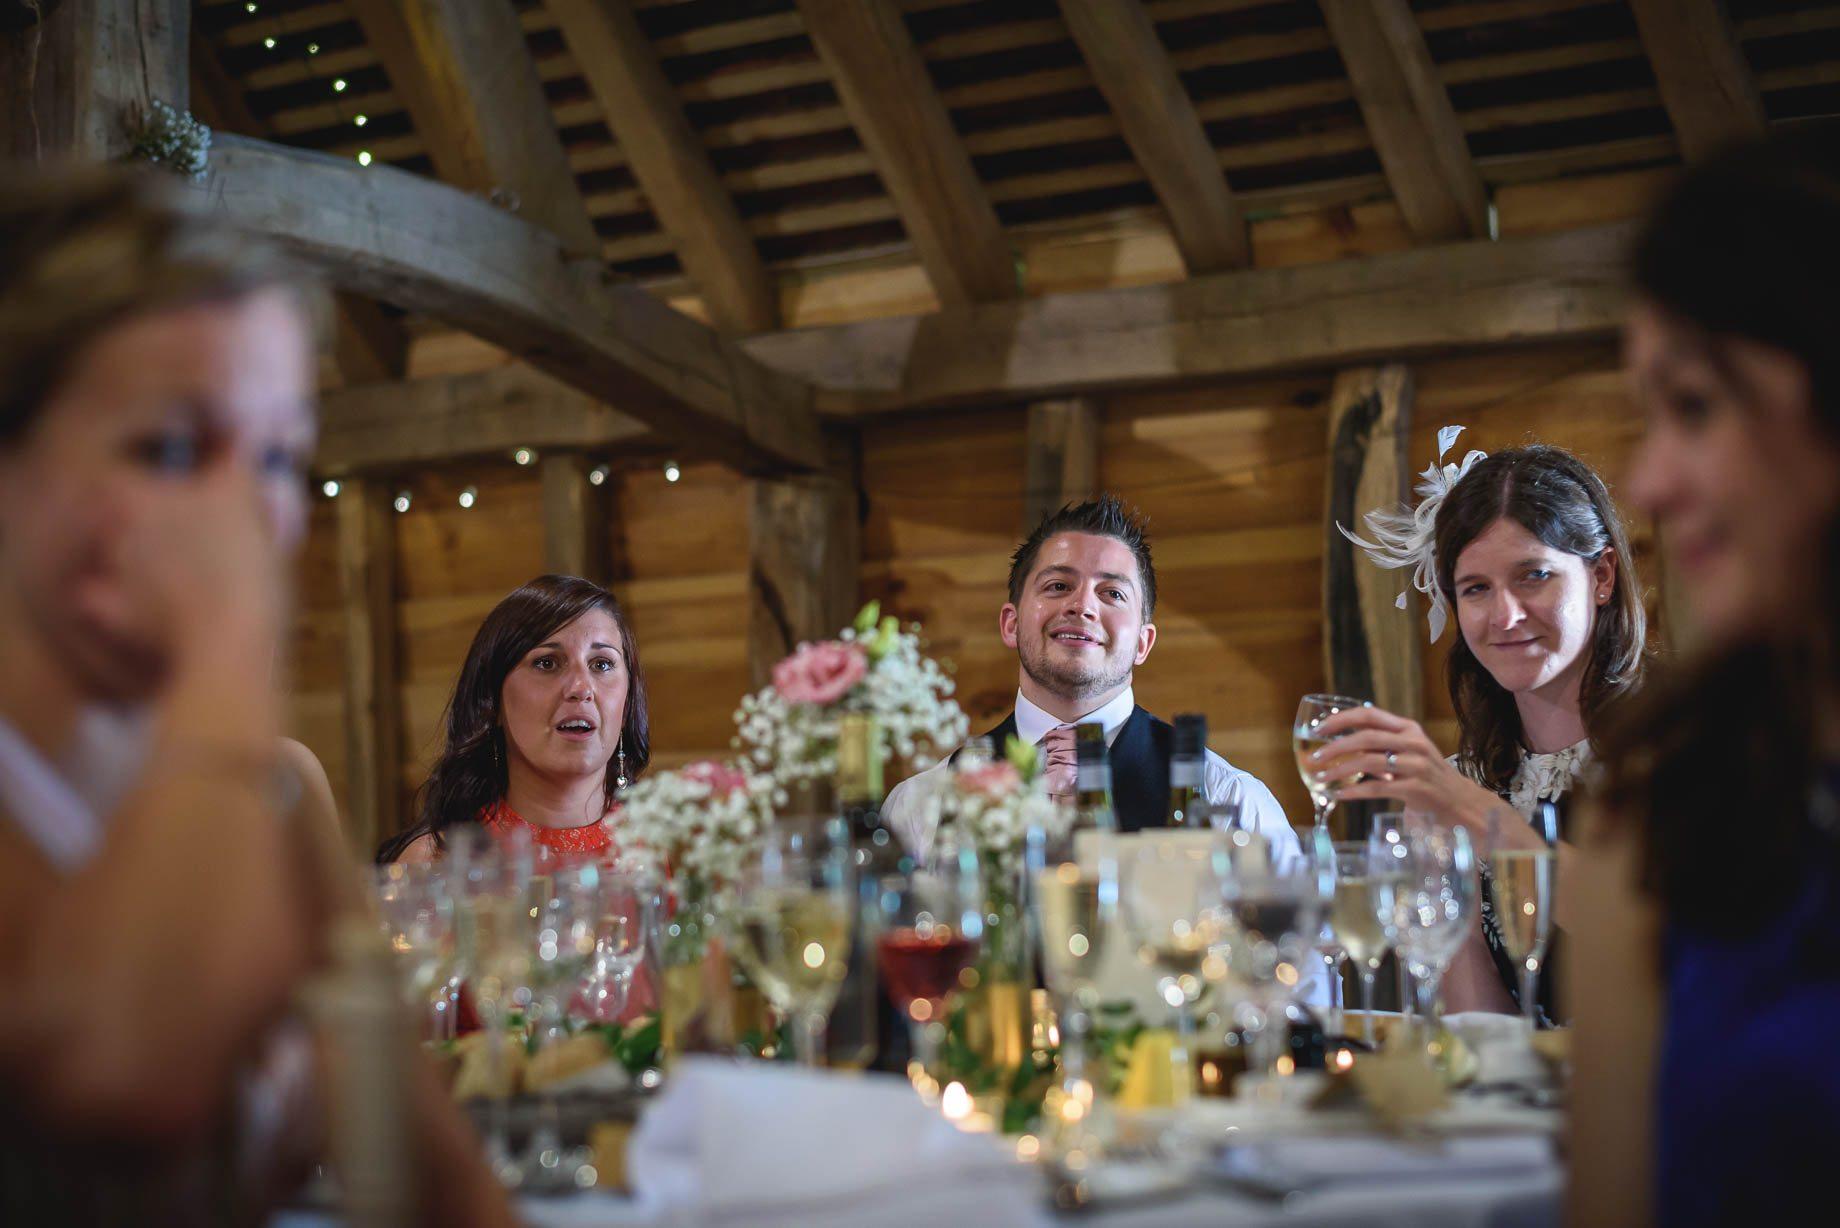 Gildings Barn wedding photography - Sarah and Steve (139 of 190)